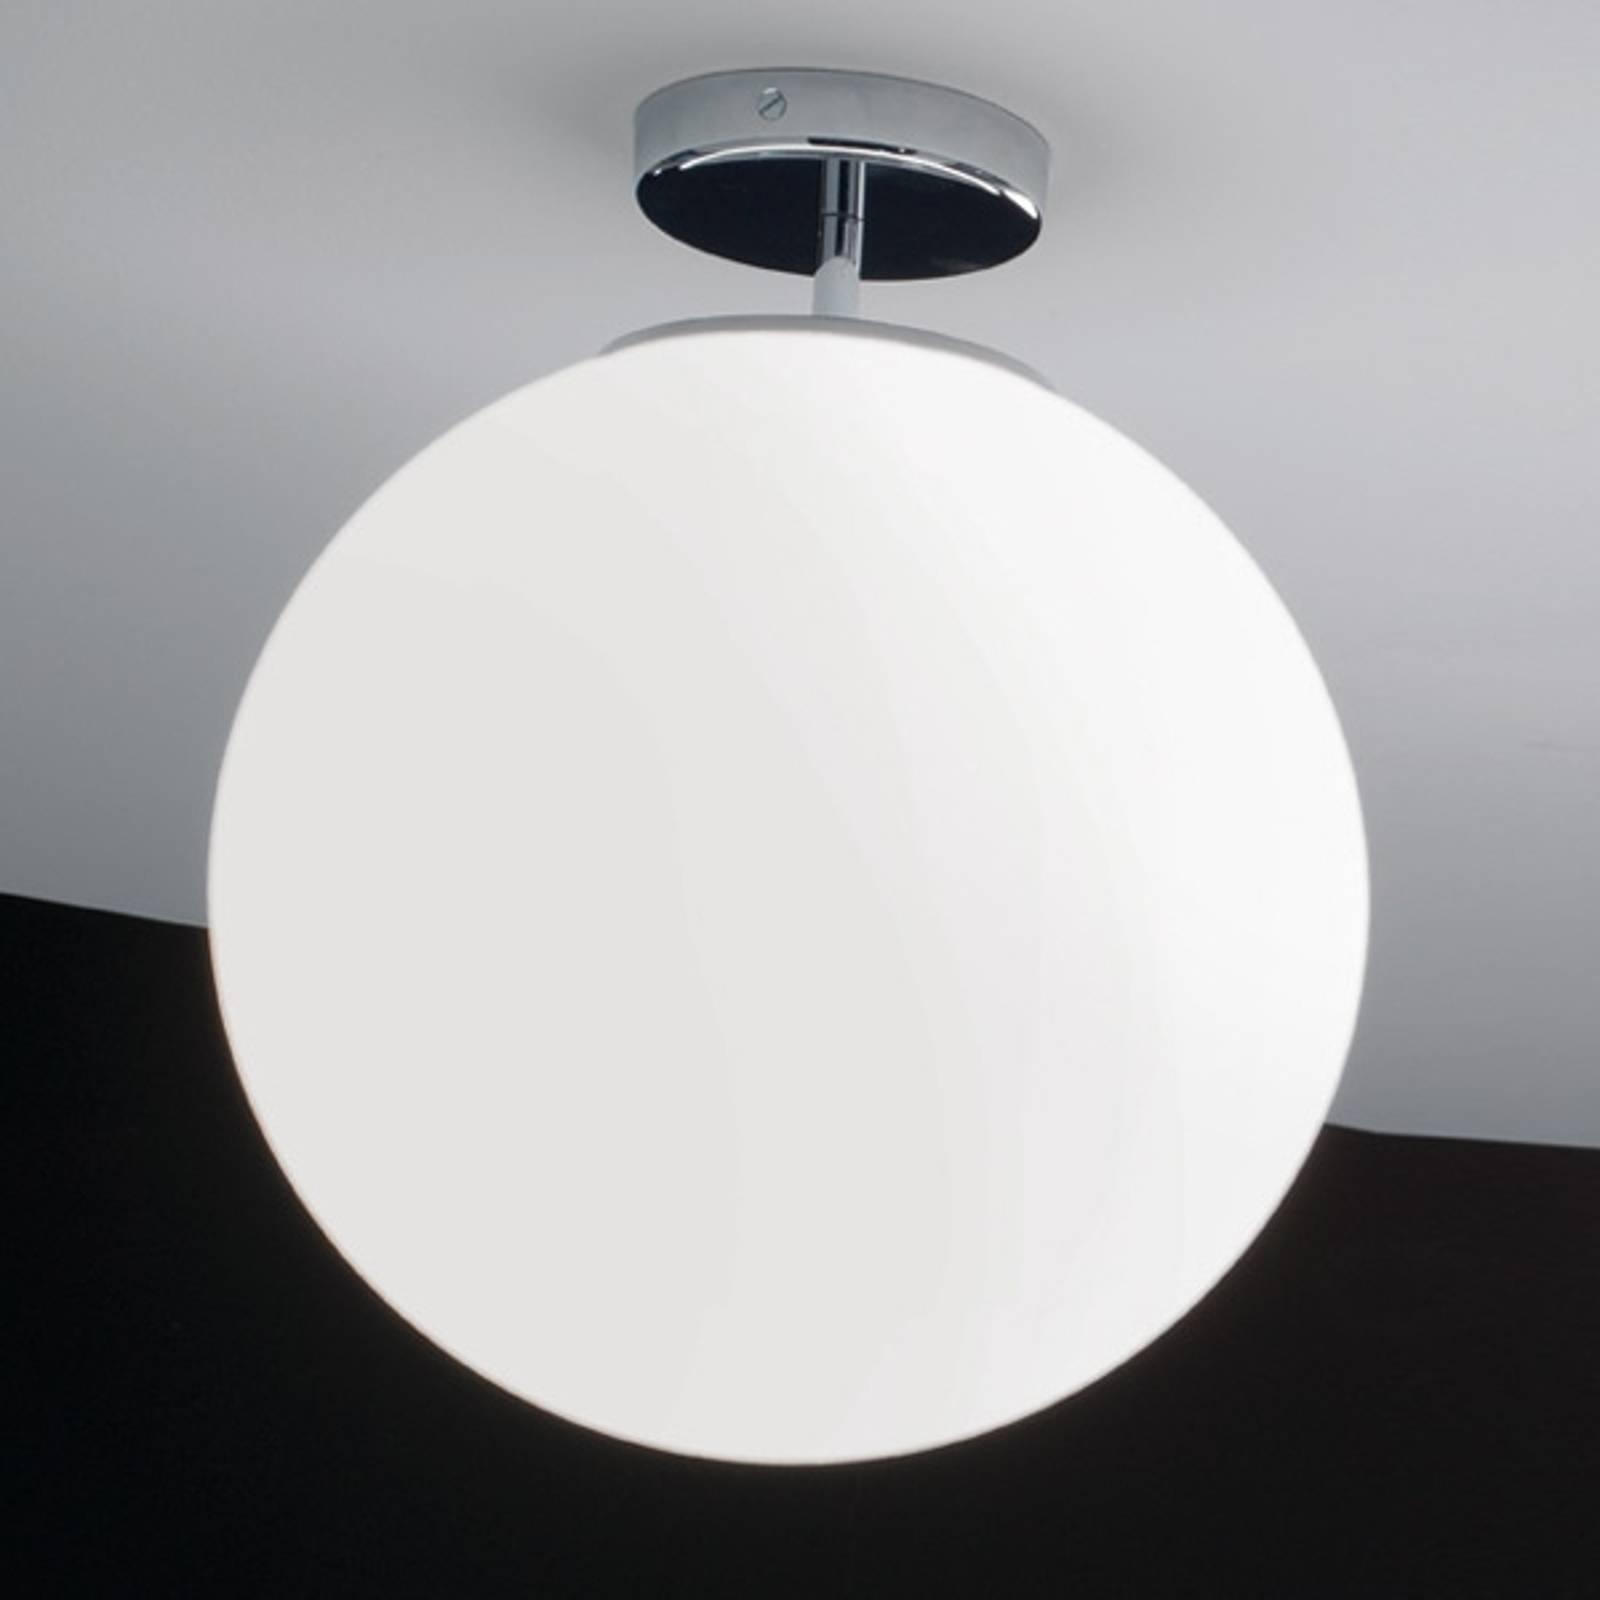 Glazen plafondlamp Sferis, 40 cm, chroom